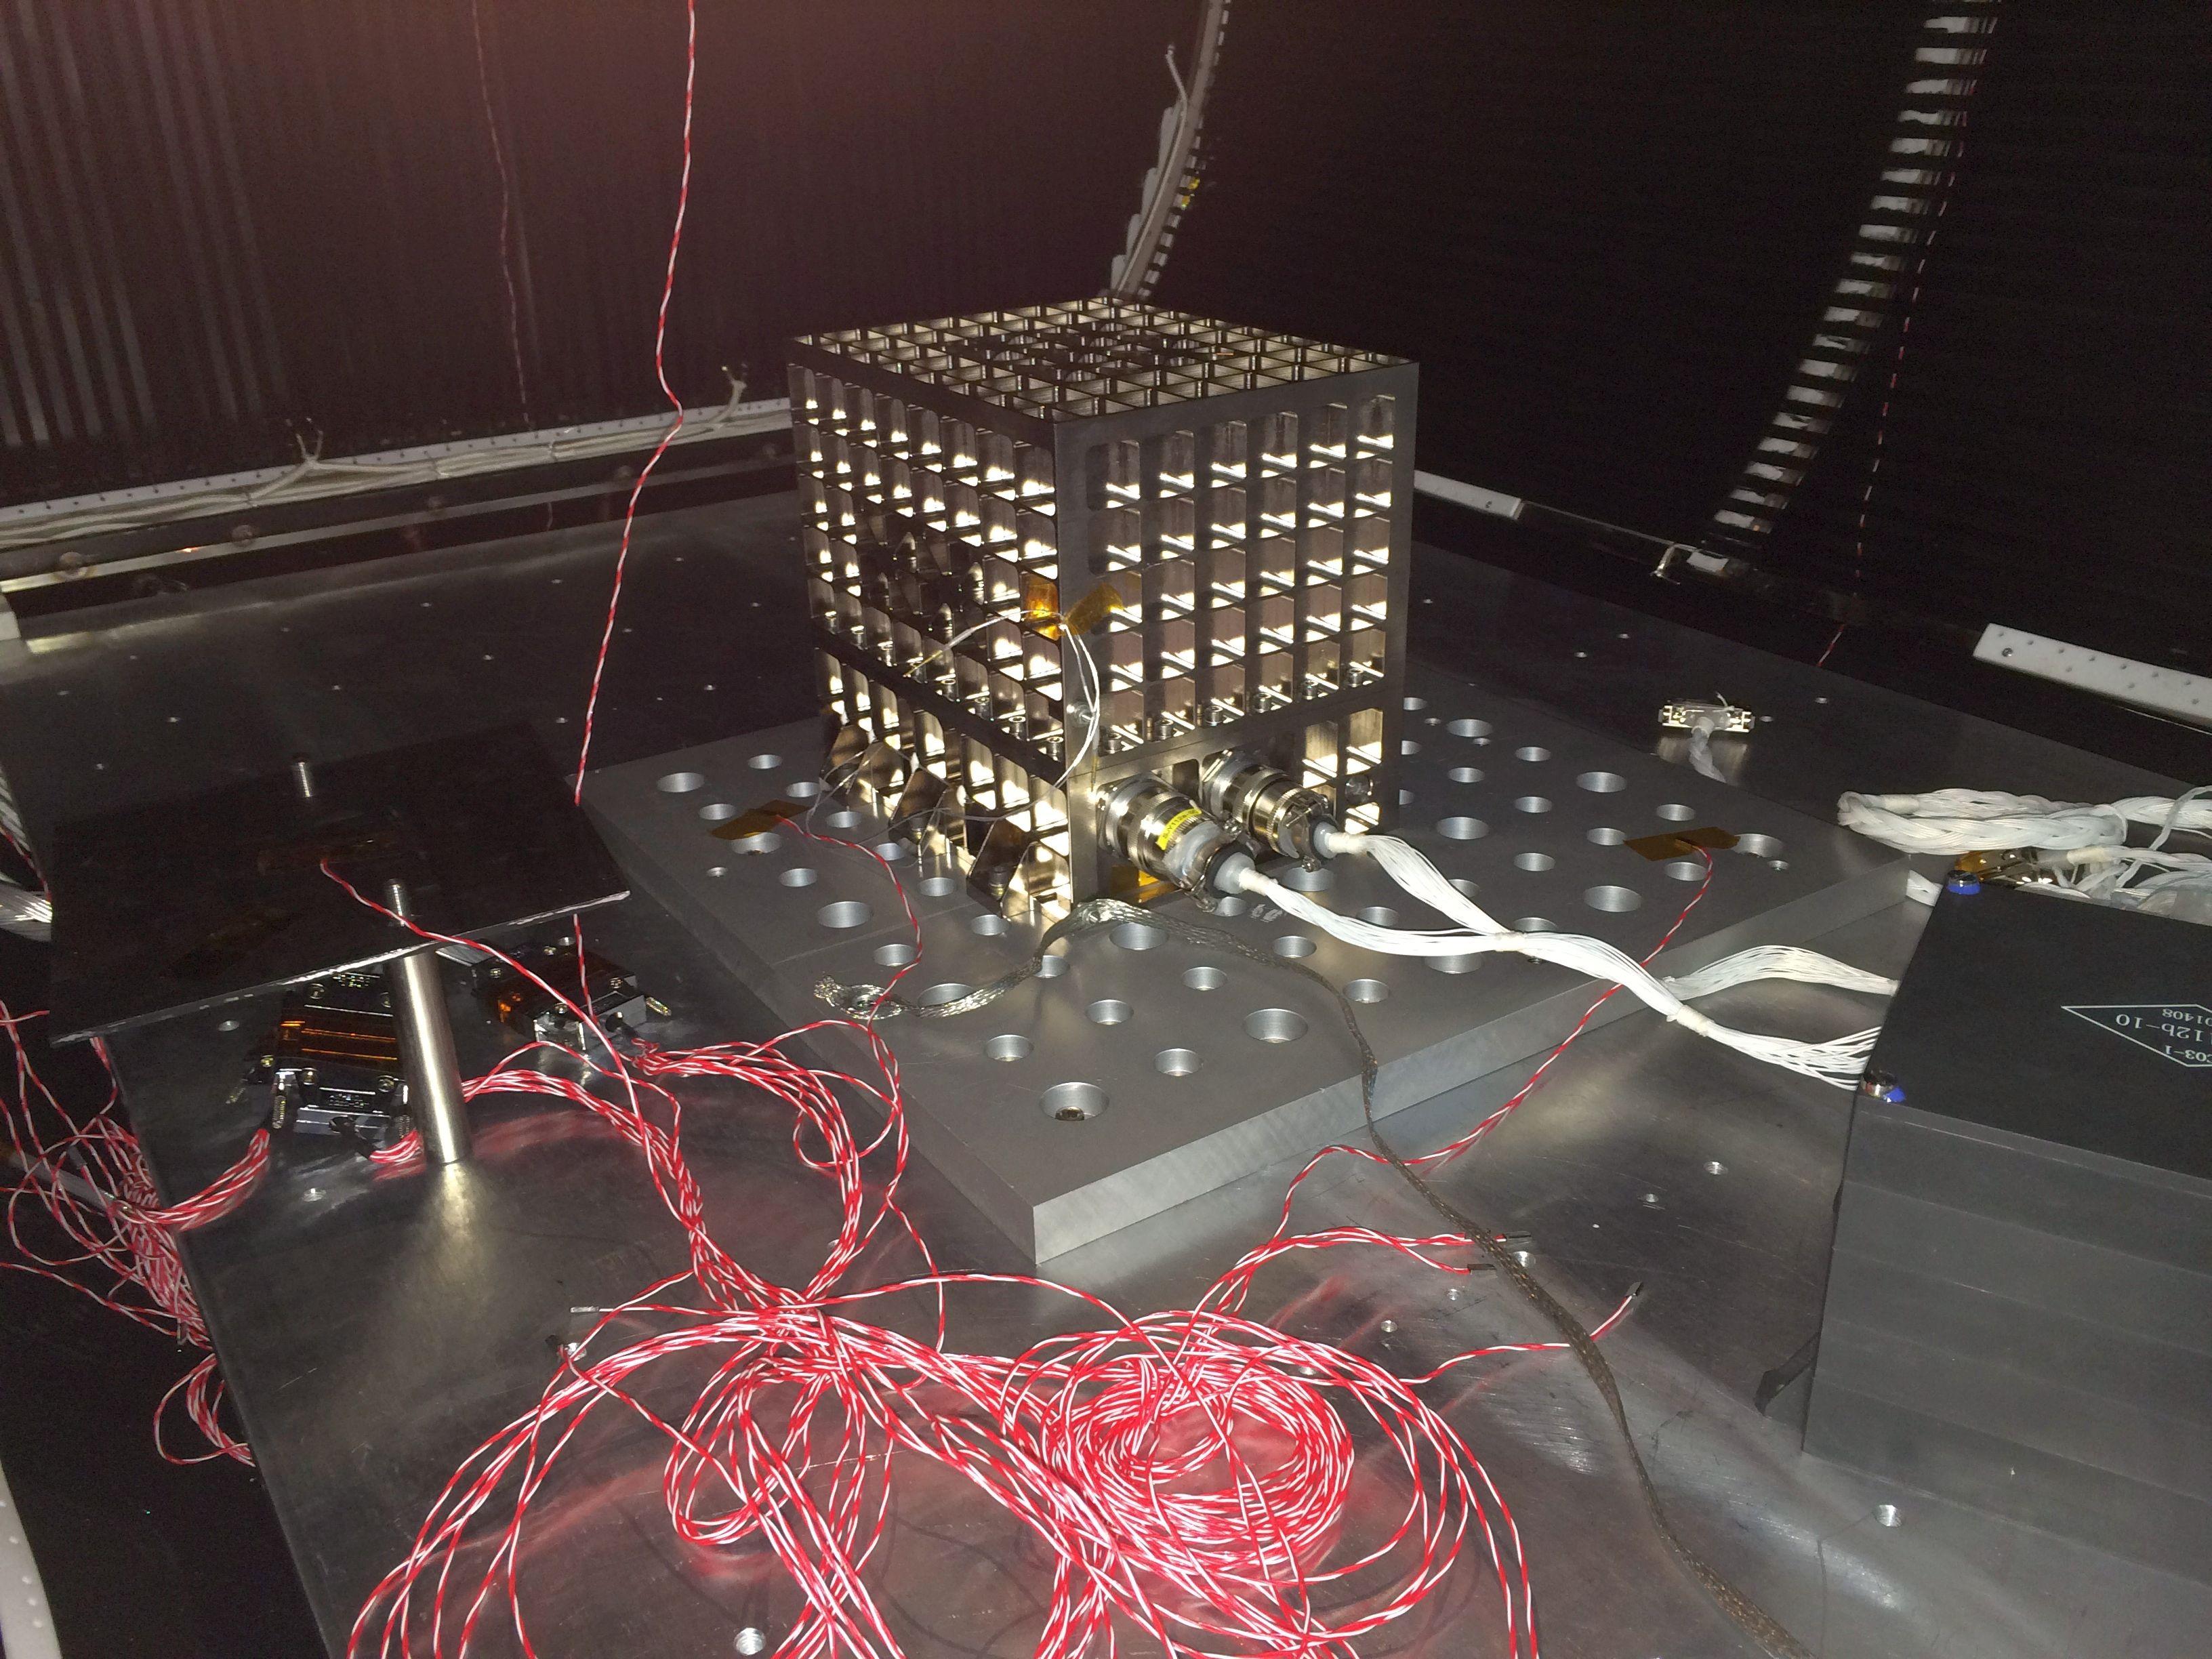 CZ-2D (SJ-10) - JSLC - 6.4.2016 Crude_oil_experiment_thermal-vacuum_testing